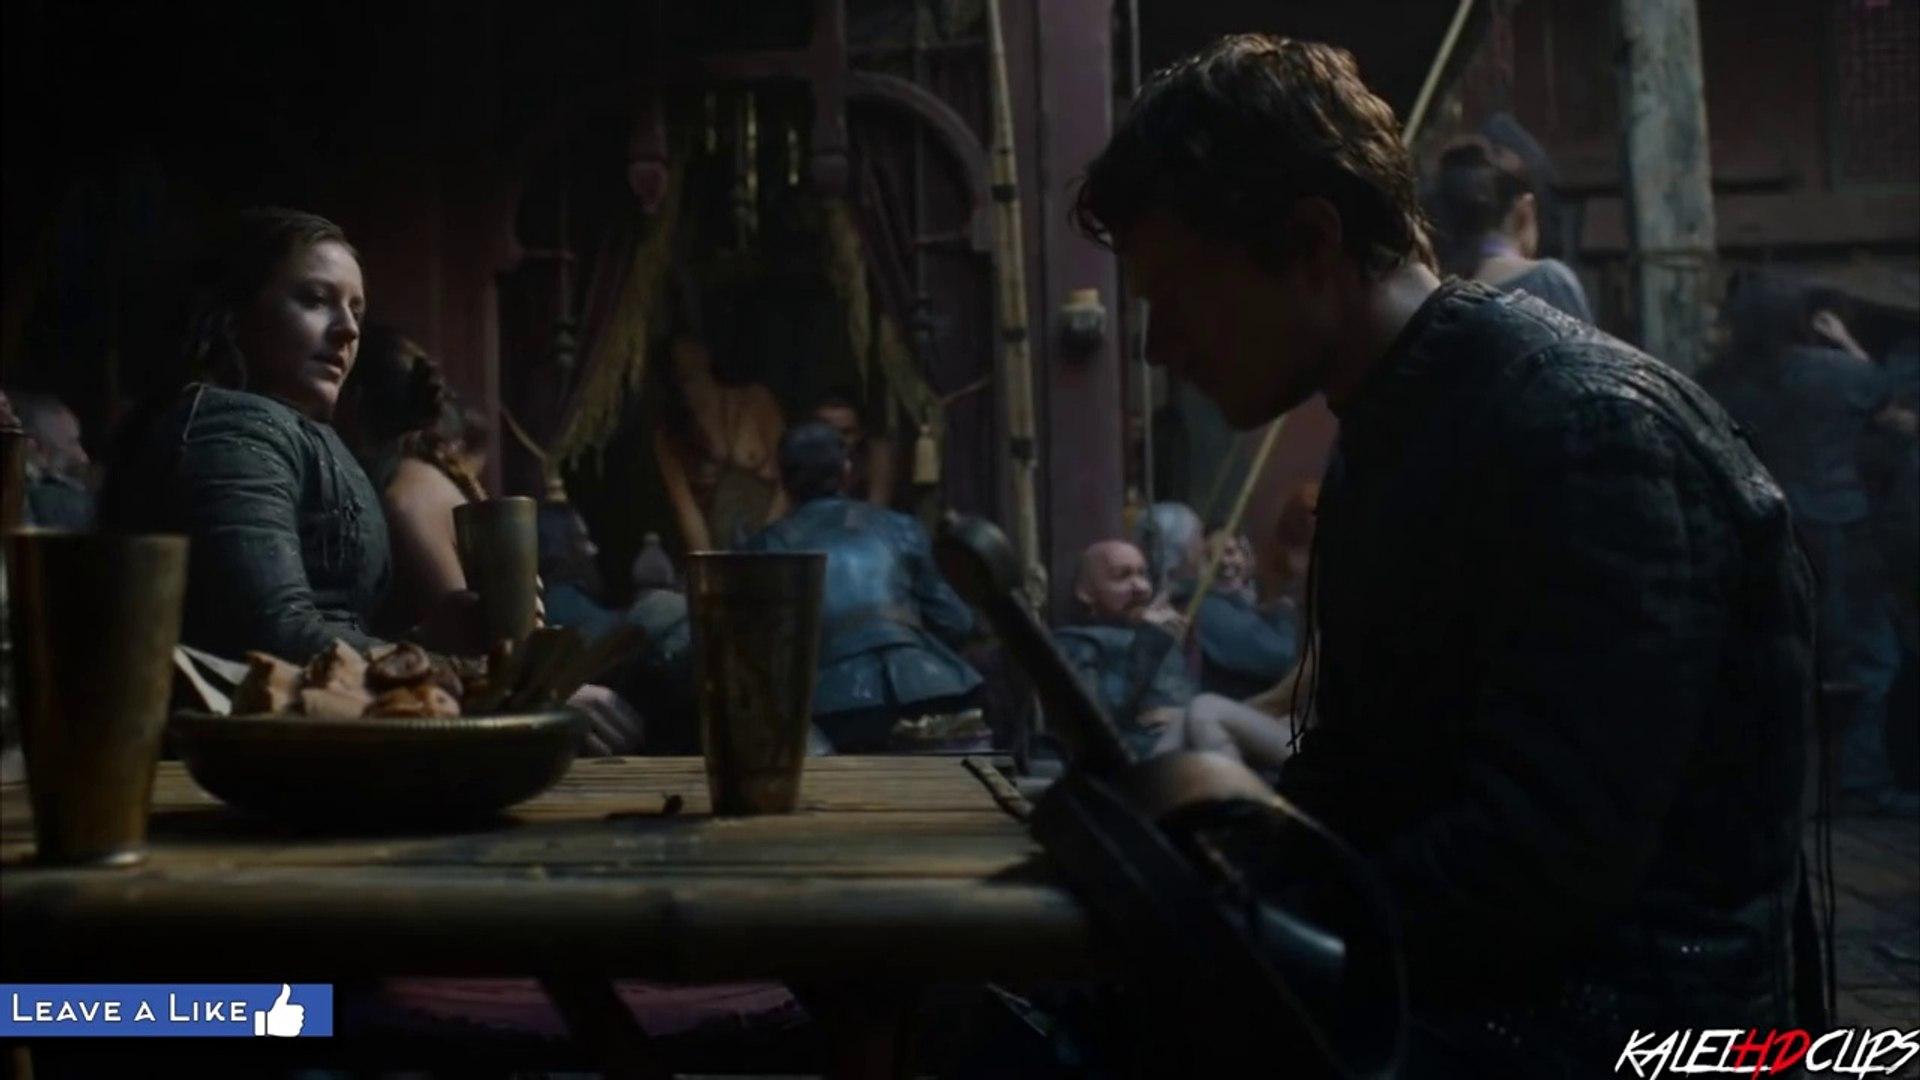 Game Of Thrones Season 6 Yara Greyjoy Likes Women Scene Video